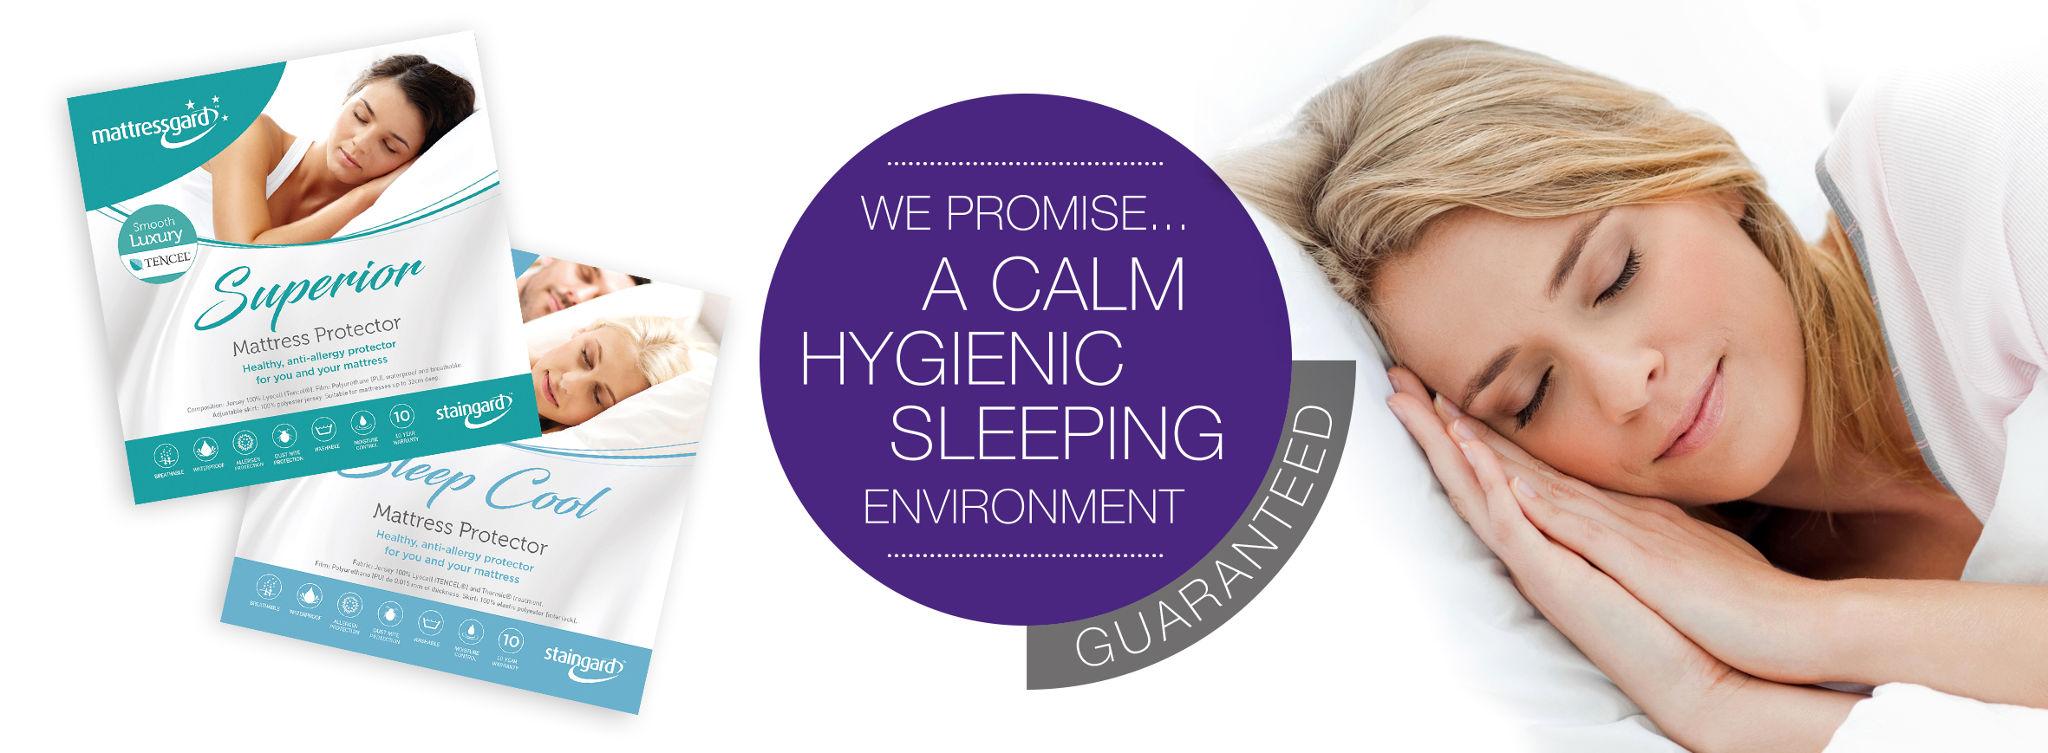 anti-allergy mattress protectors